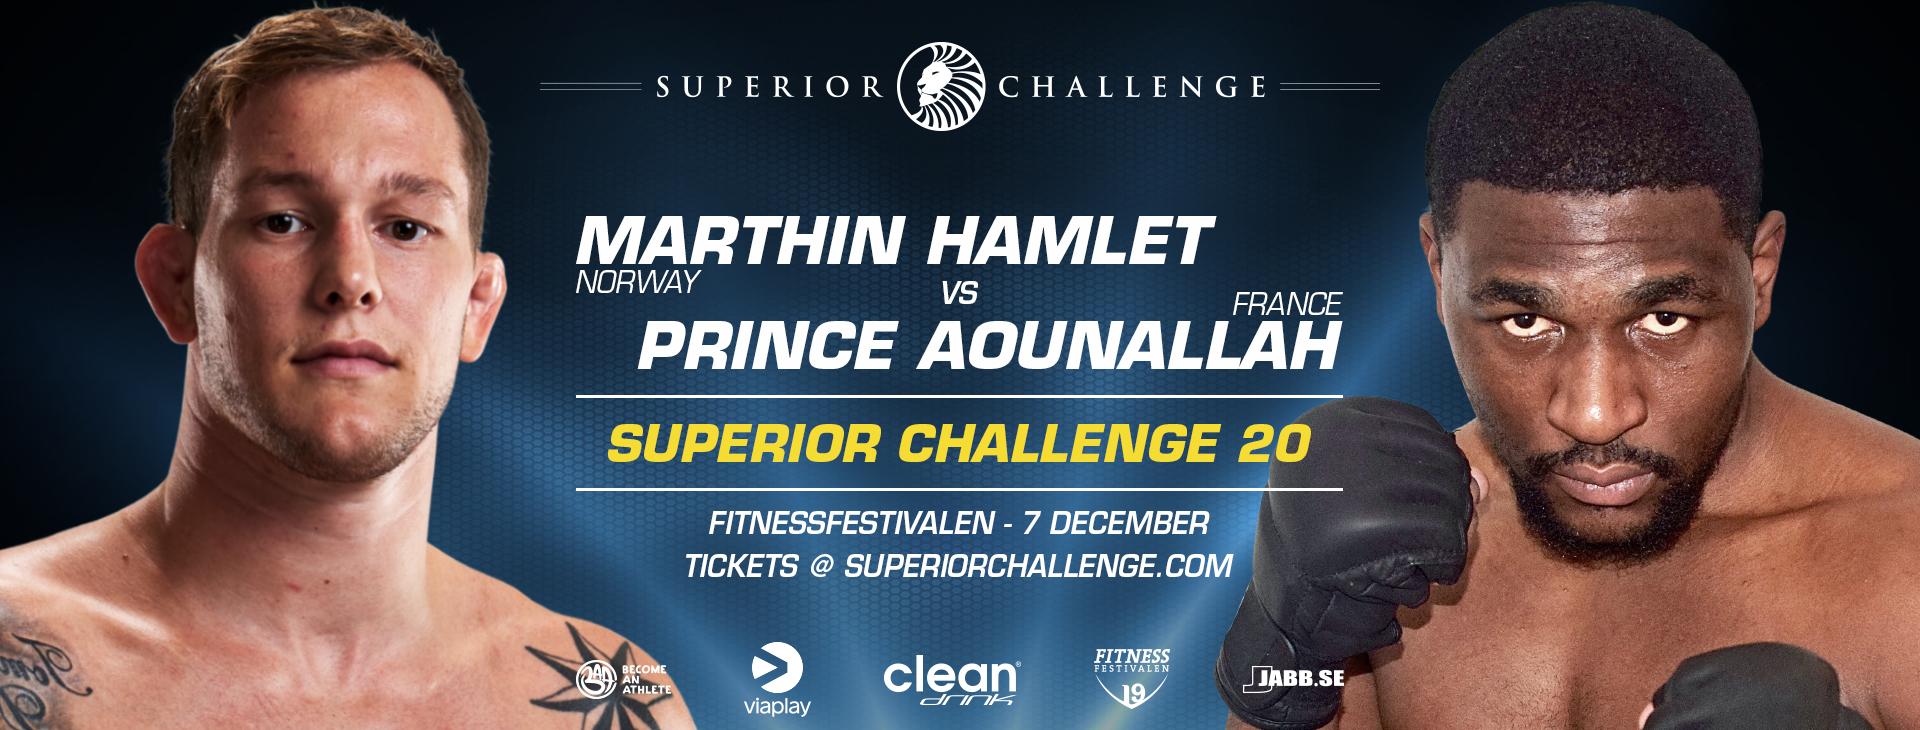 Marthin Hamlet vs Prince Aounallah at Superior Challenge 20 - Fitnessfestivalen